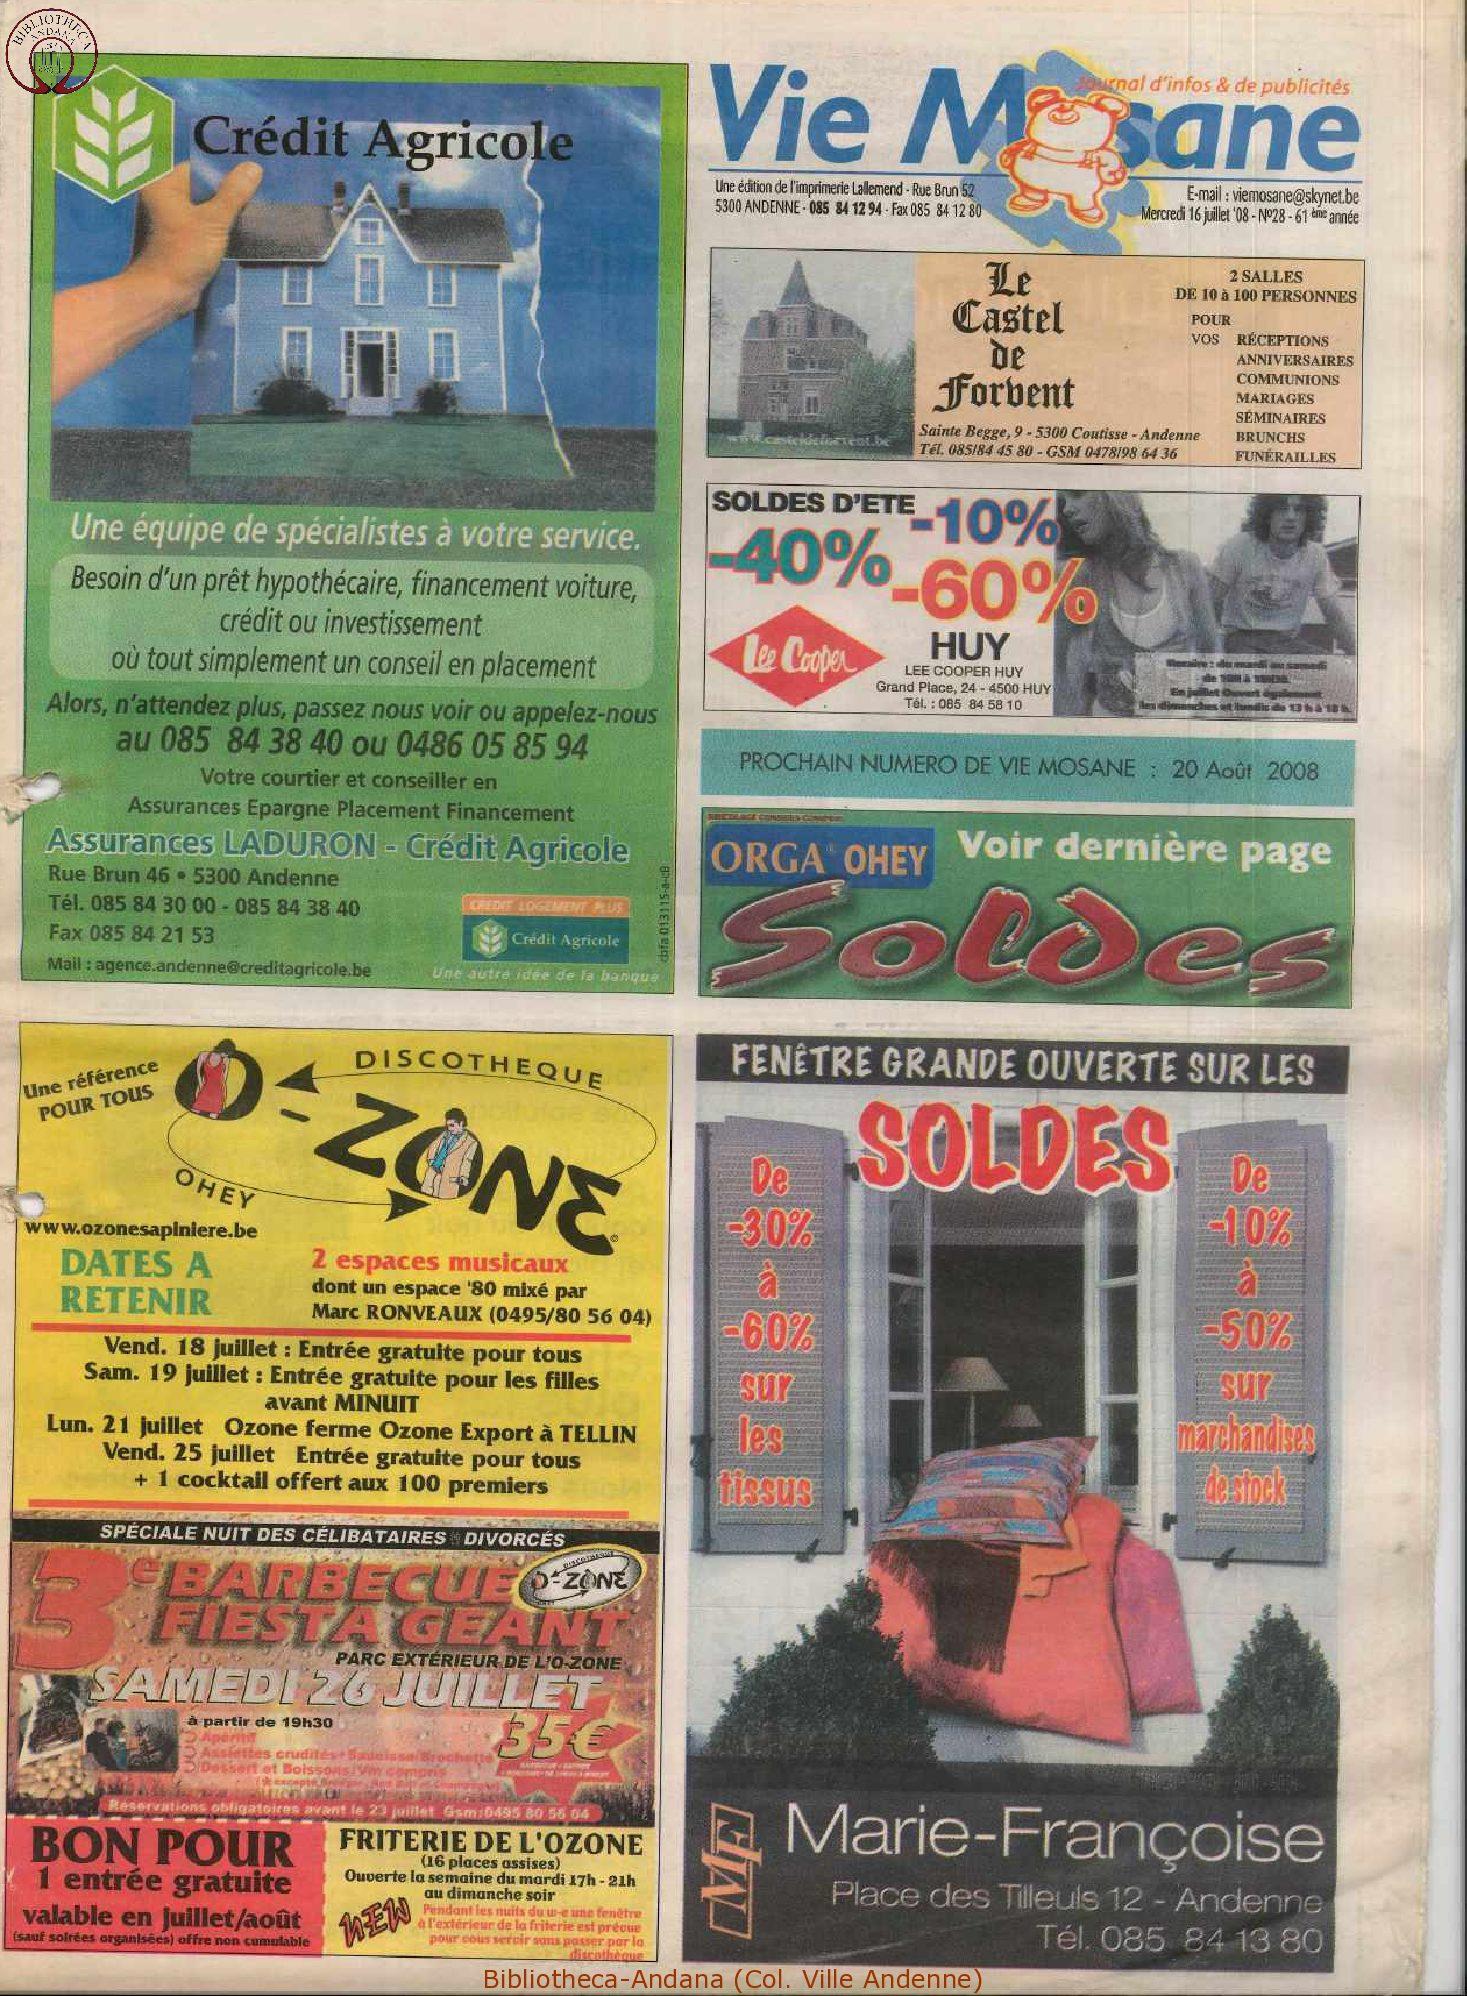 61e année - n°28 - 16 juillet 2008